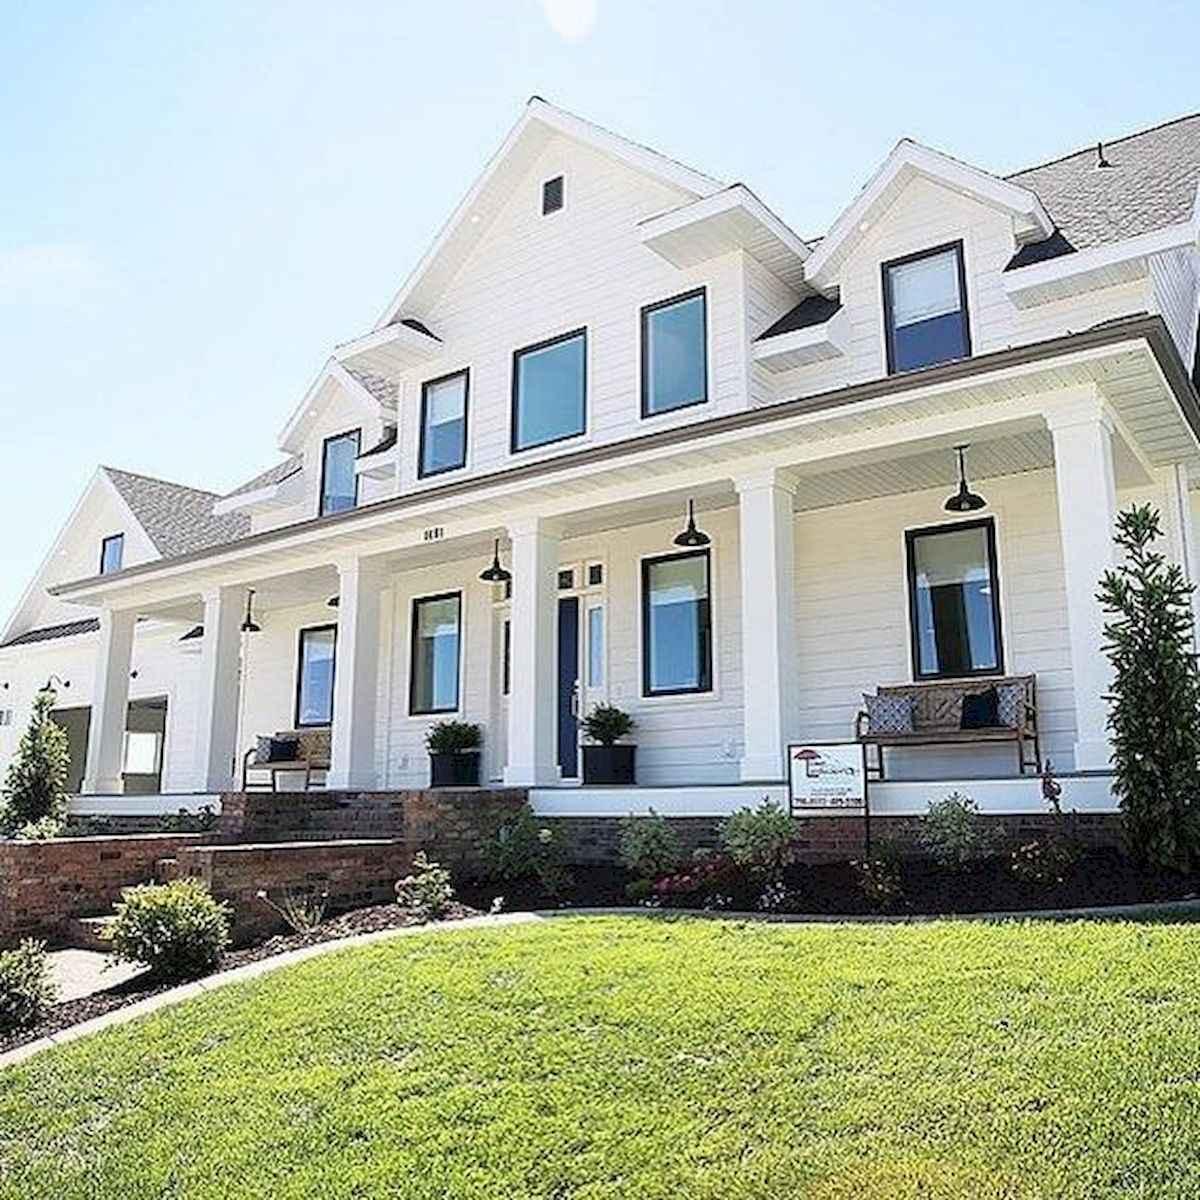 40 Stunning Mansions Luxury Exterior Design Ideas (27)